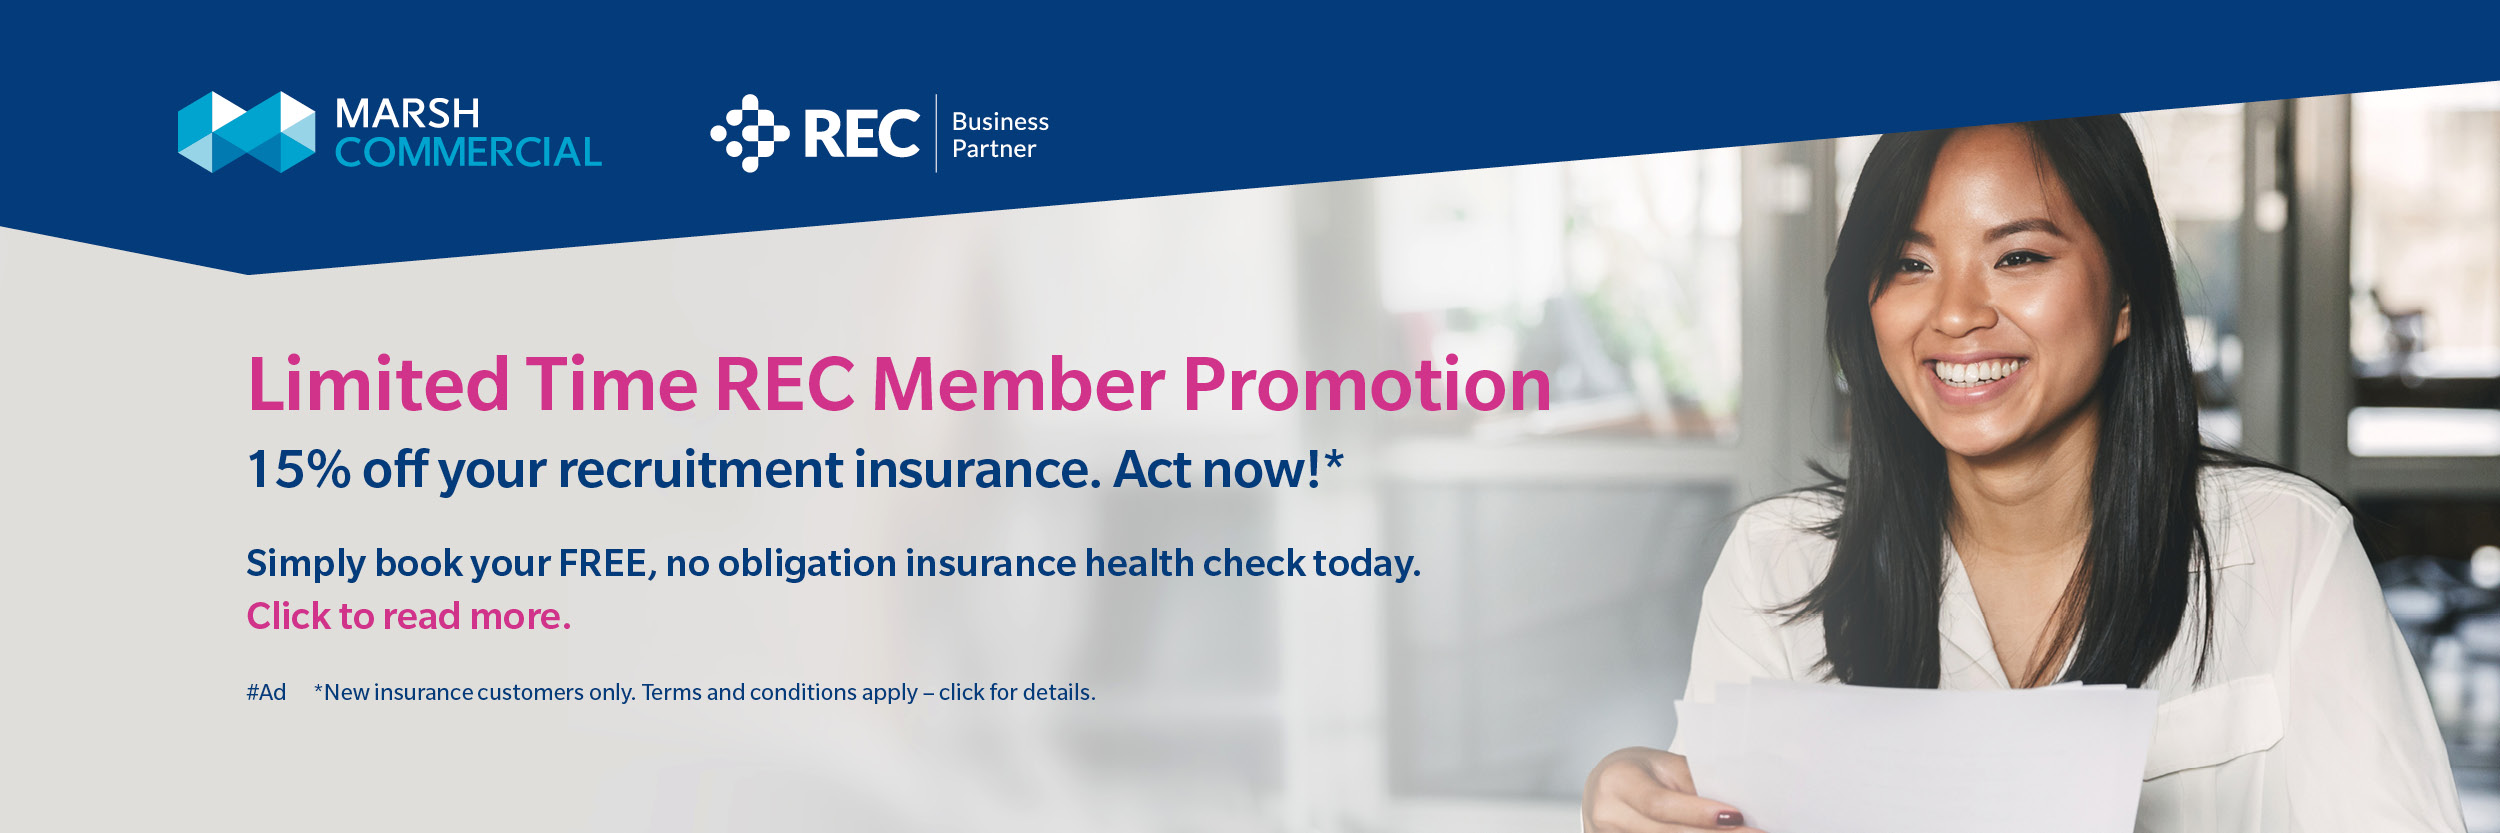 Marsh - REC Health Check